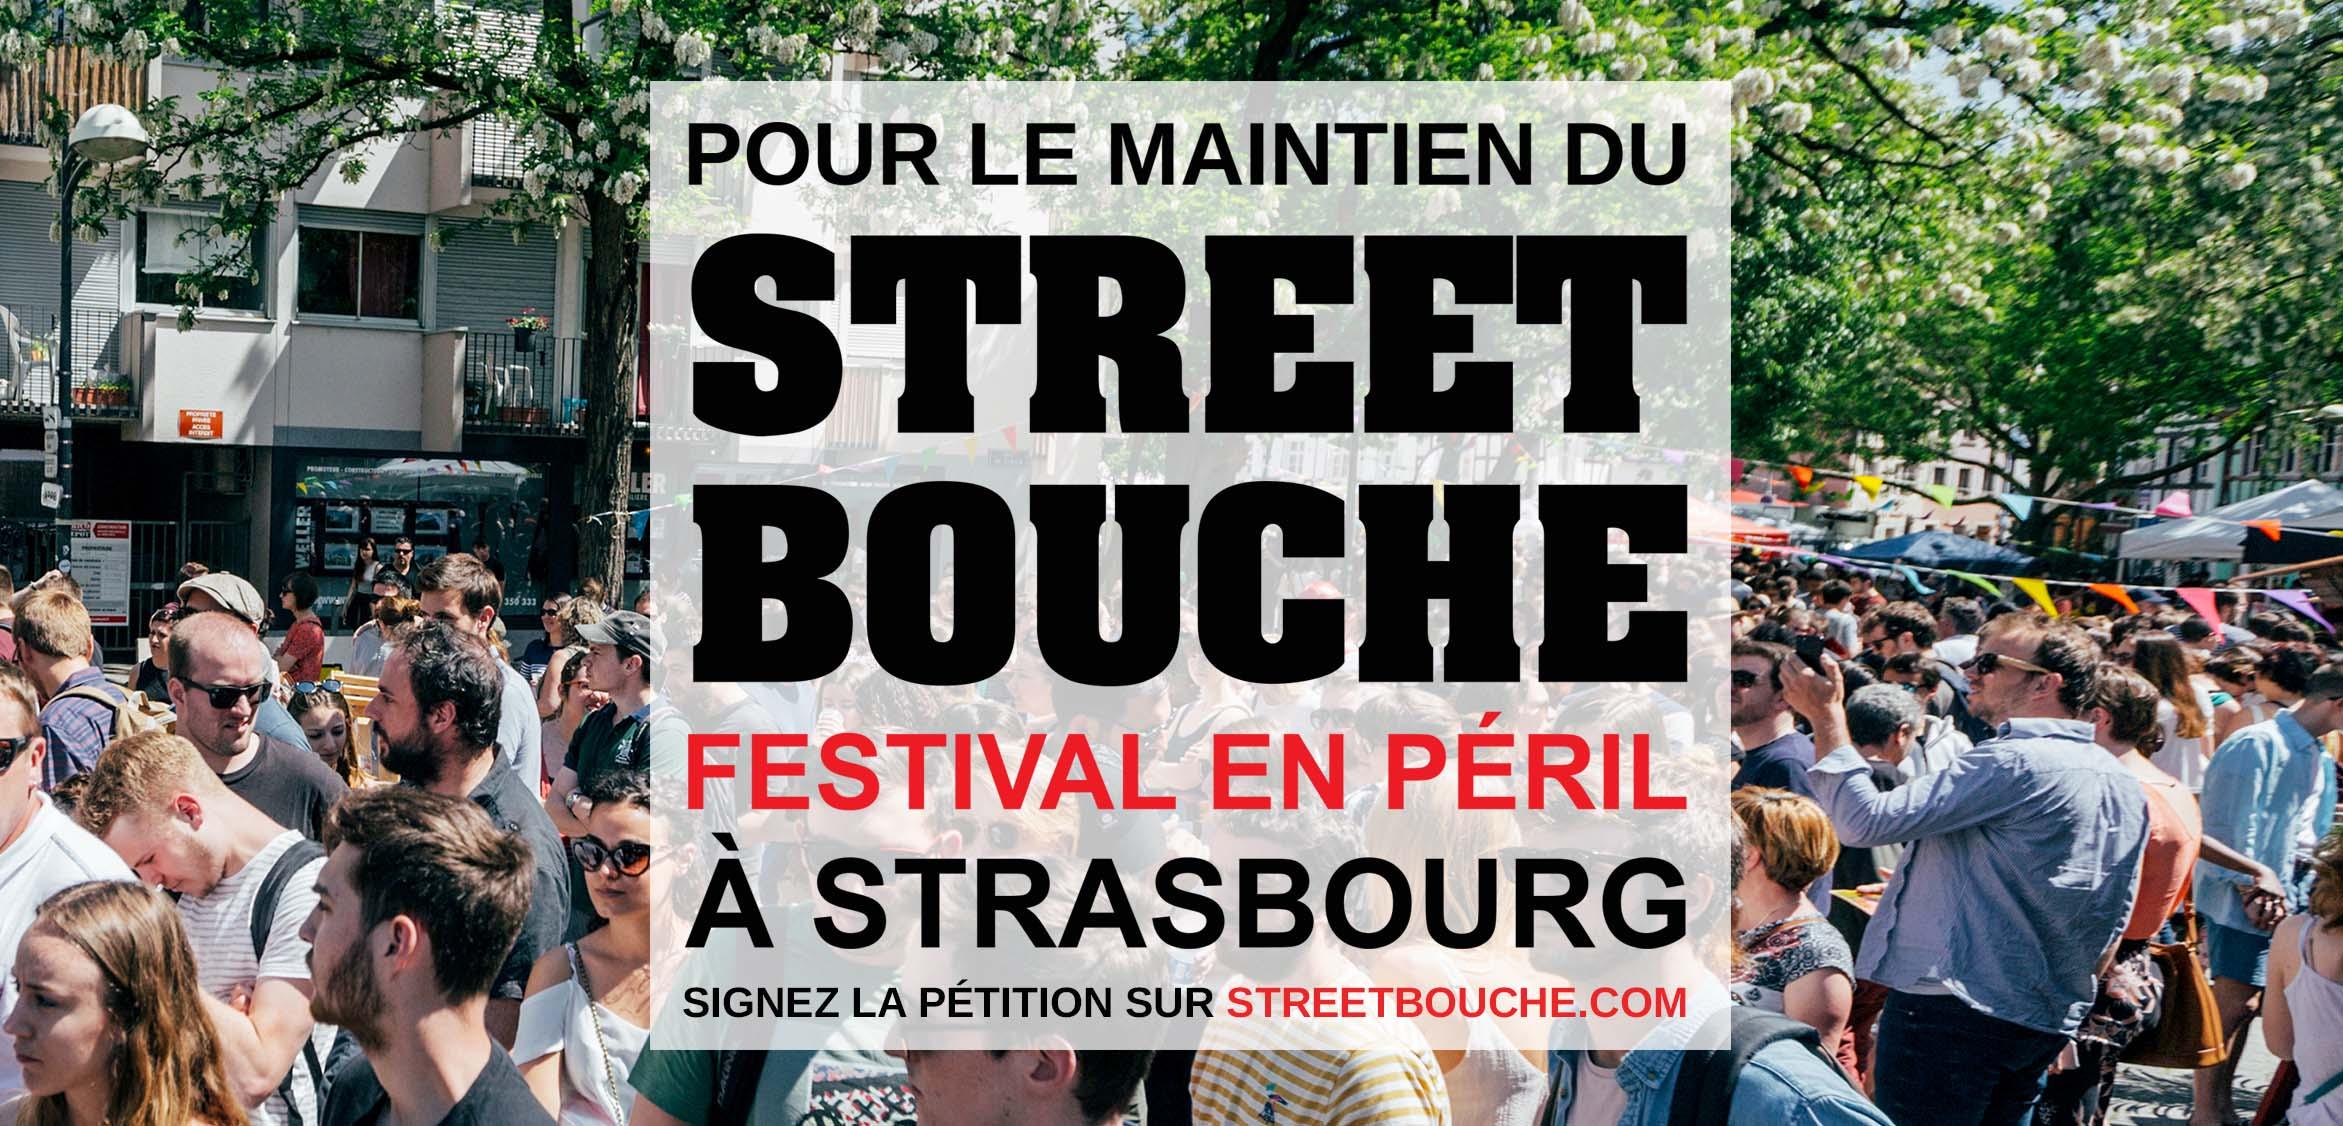 street bouche petition maintien festival - Street Bouche